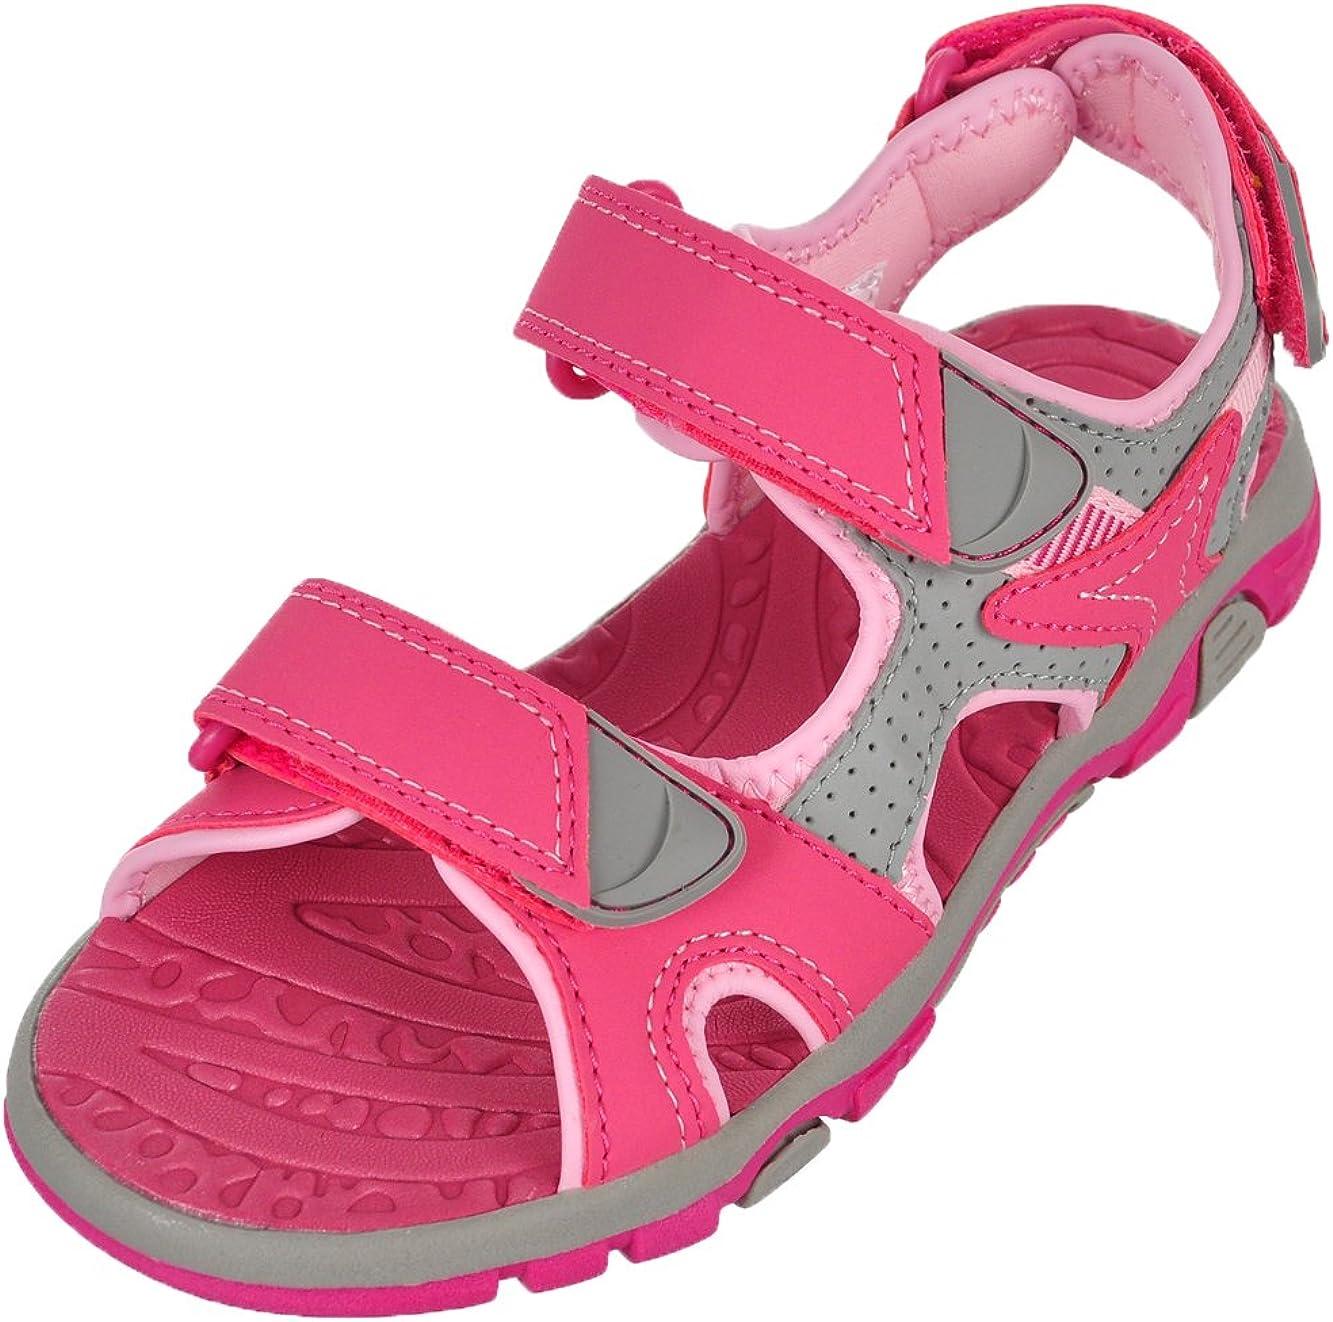 Khombu Girl's River Sandal Pink/Grey